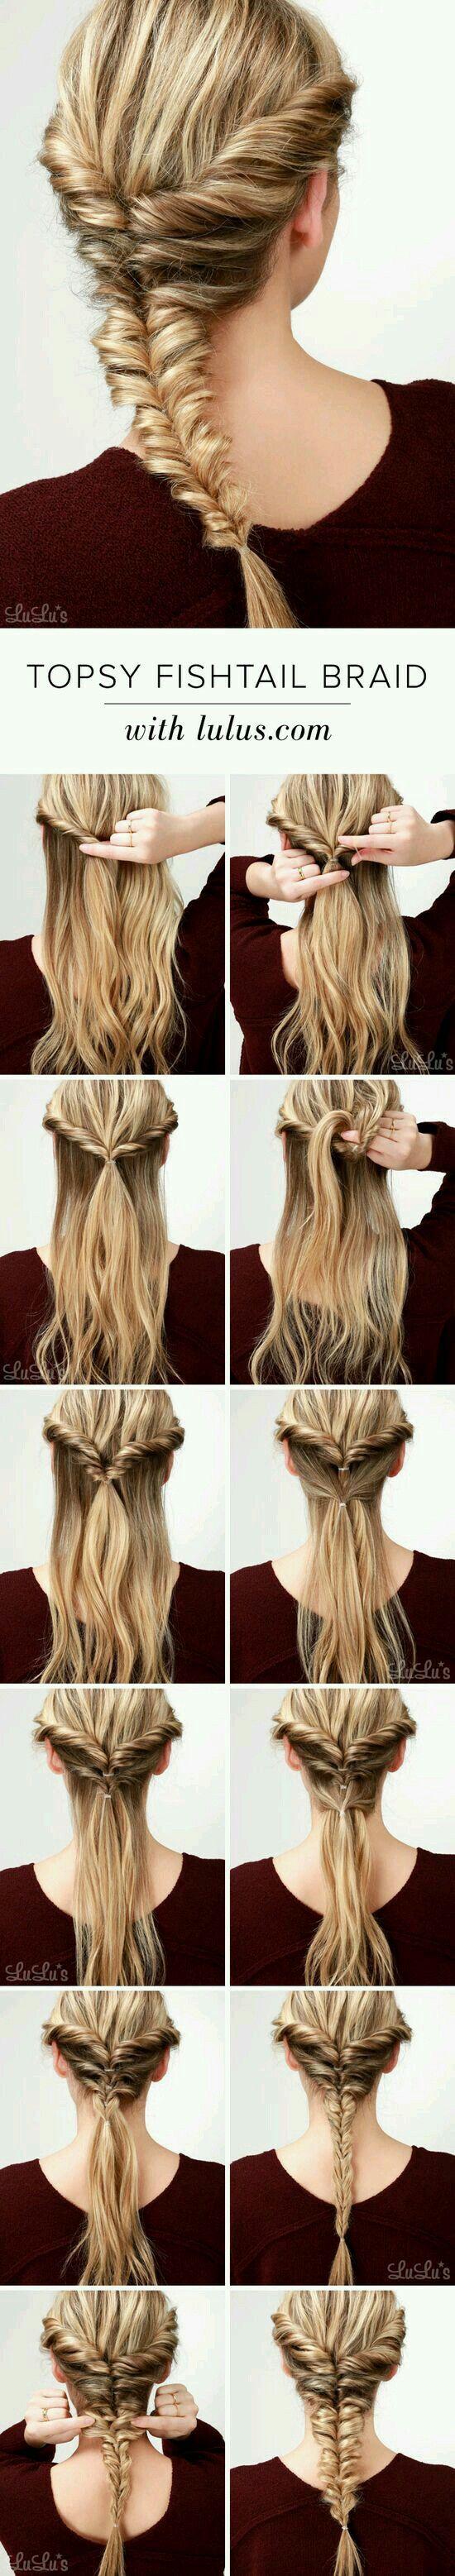 30 Amazing Braided Hairstyles For Medium & Long  Hair.